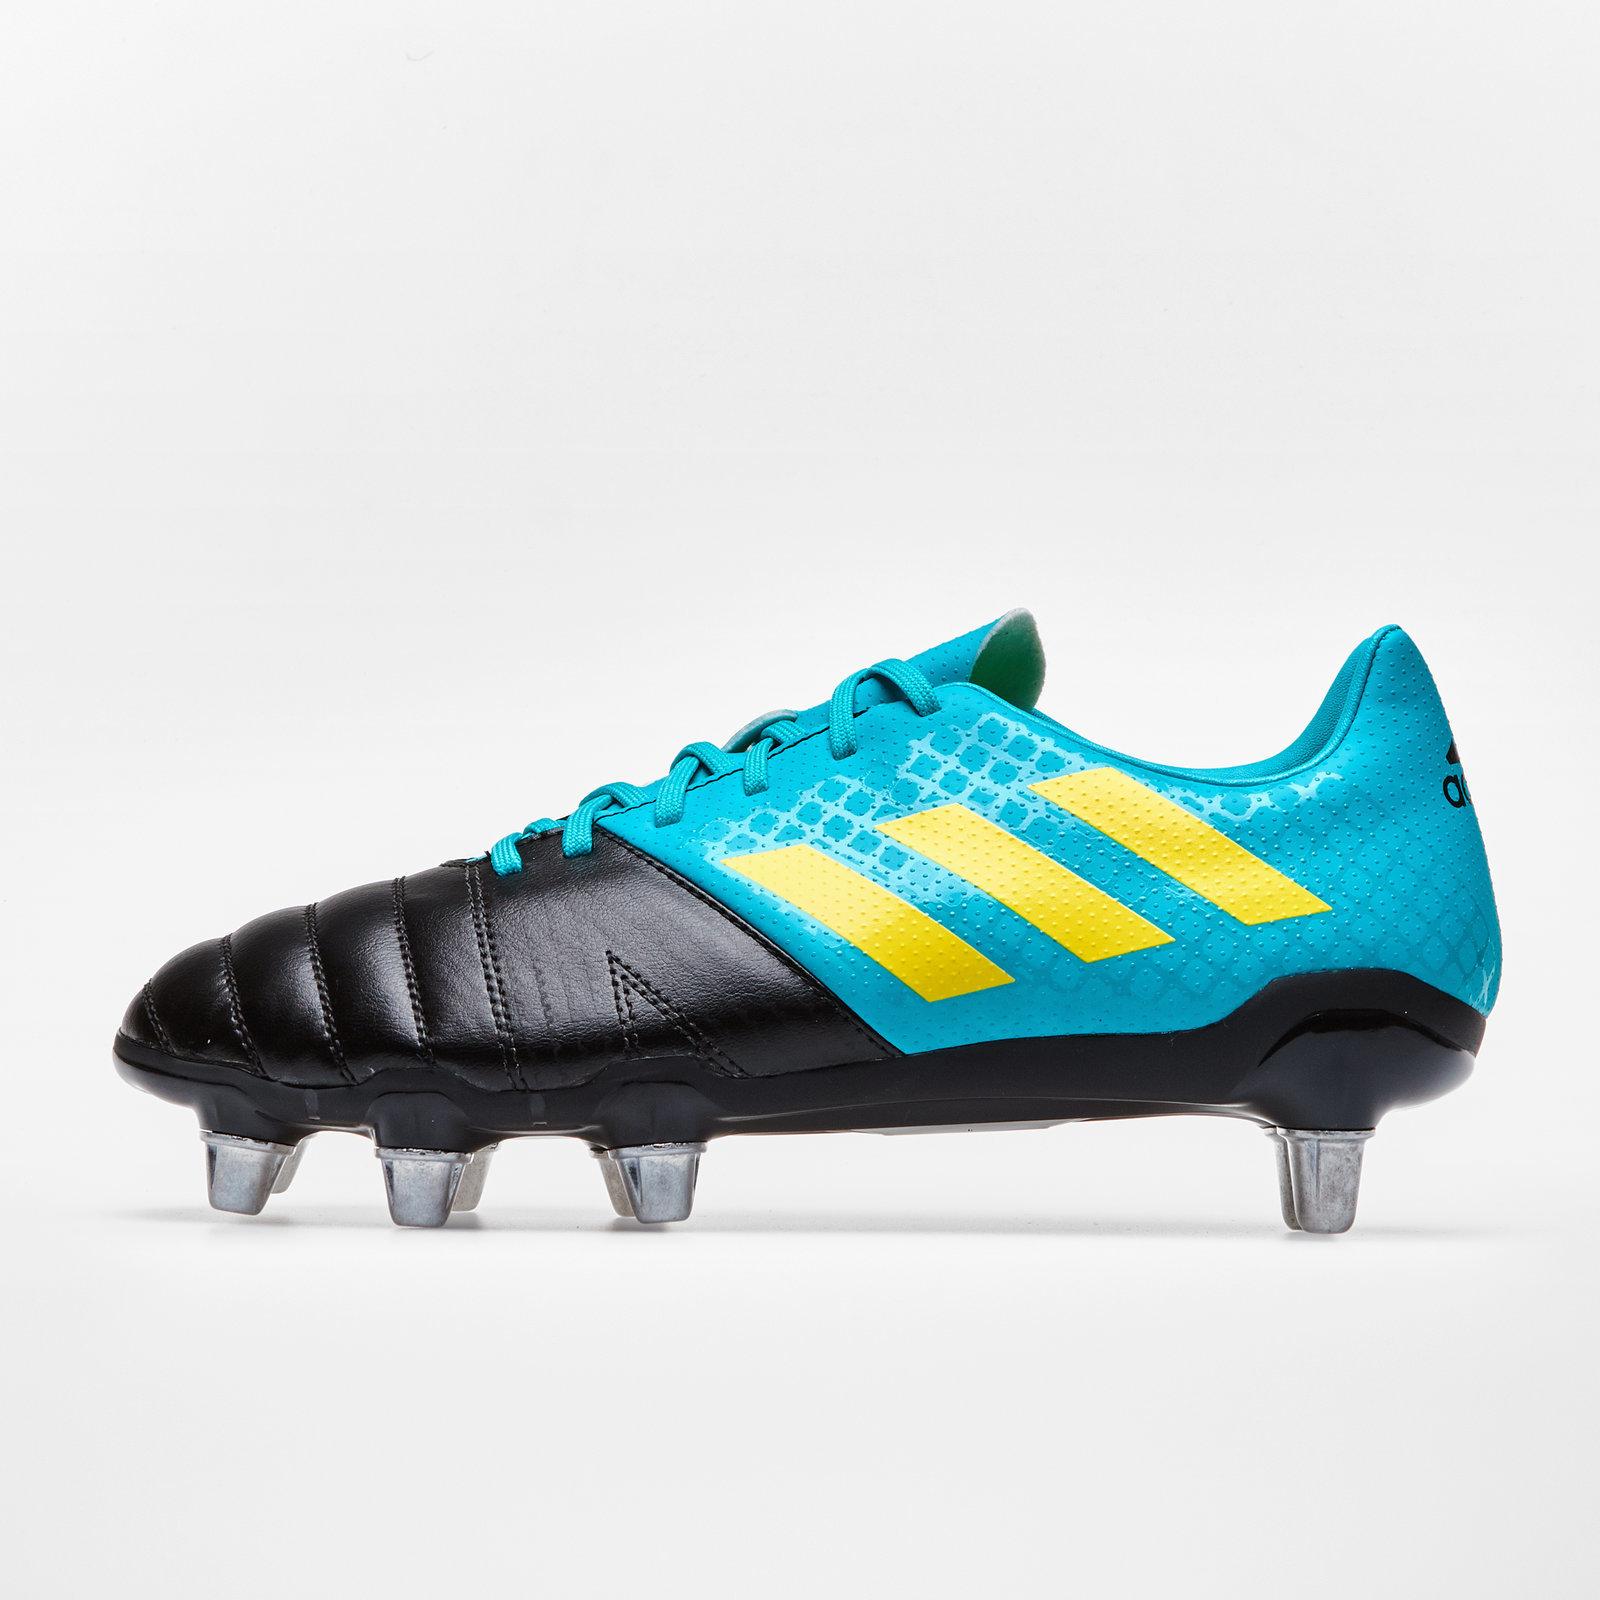 2d2e0bc9e2f5 adidas Mens Kakari Soft Ground Rugby Boots Sports Shoes Studs Blue ...